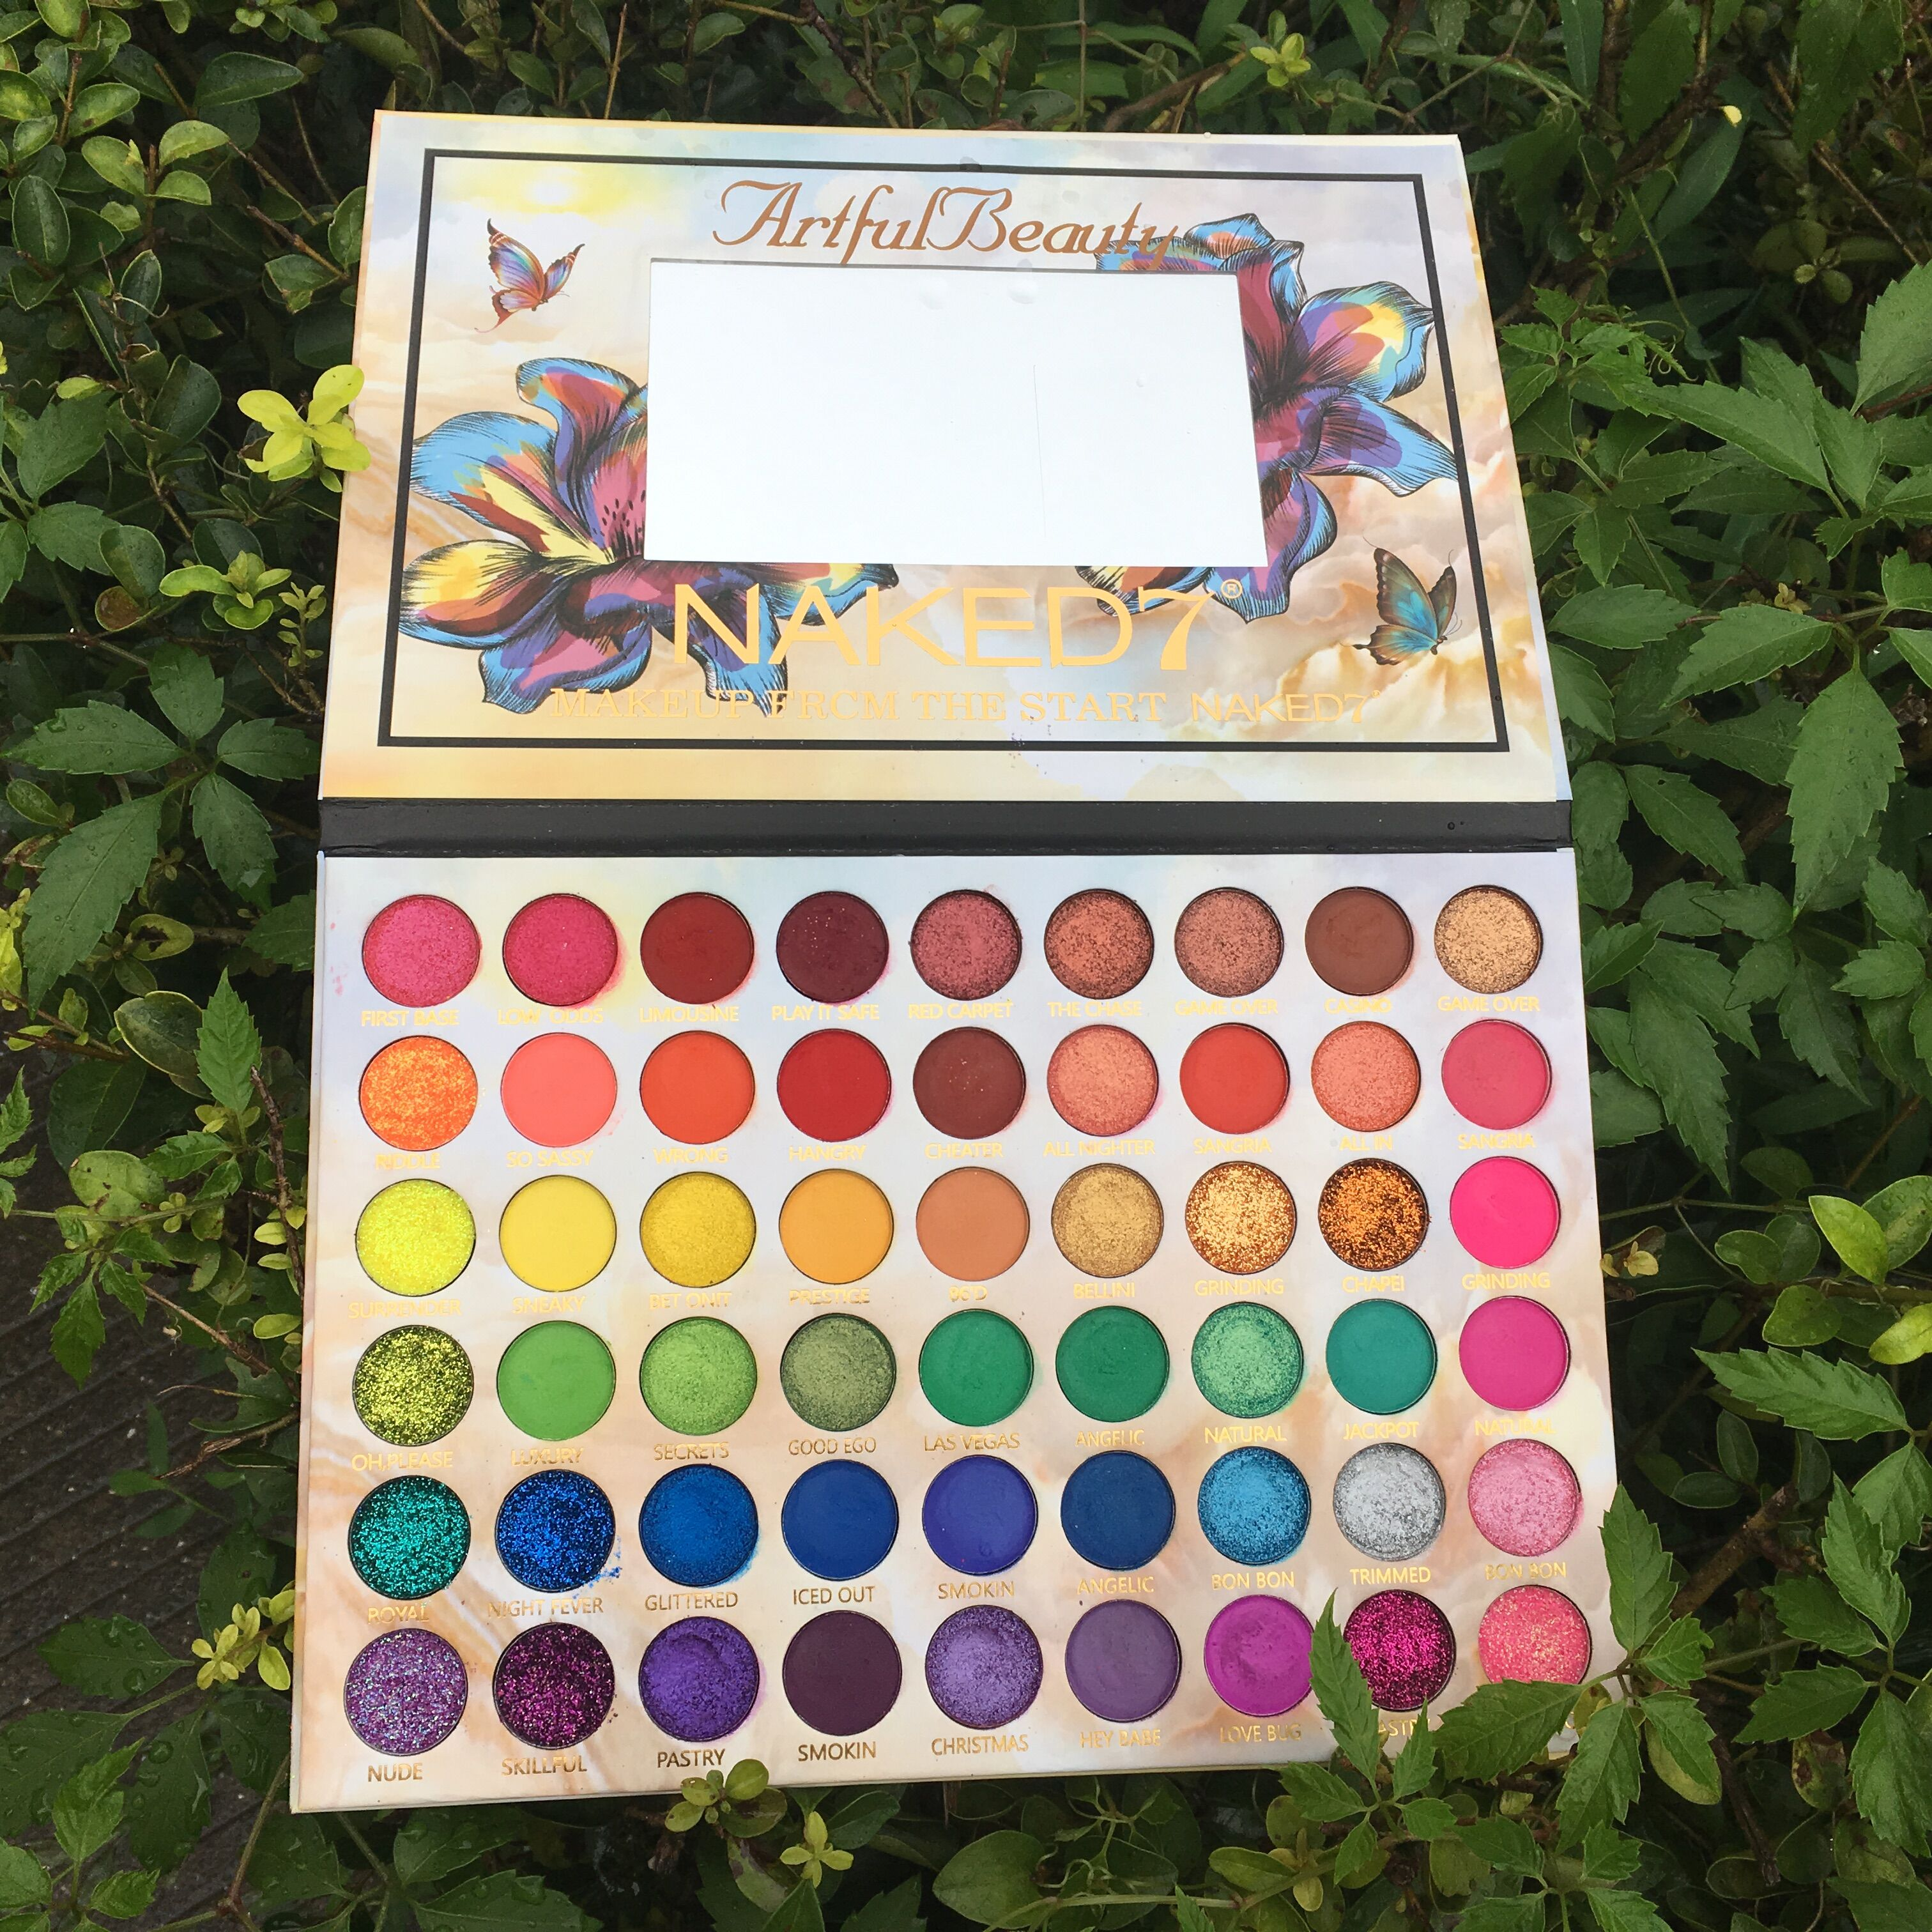 2019 New Makeup Artful Beauty Eyeshadow Palette 54 Colors Matte Shimmer Glitter Pigment Eye Shadow Pallete Cosmetic